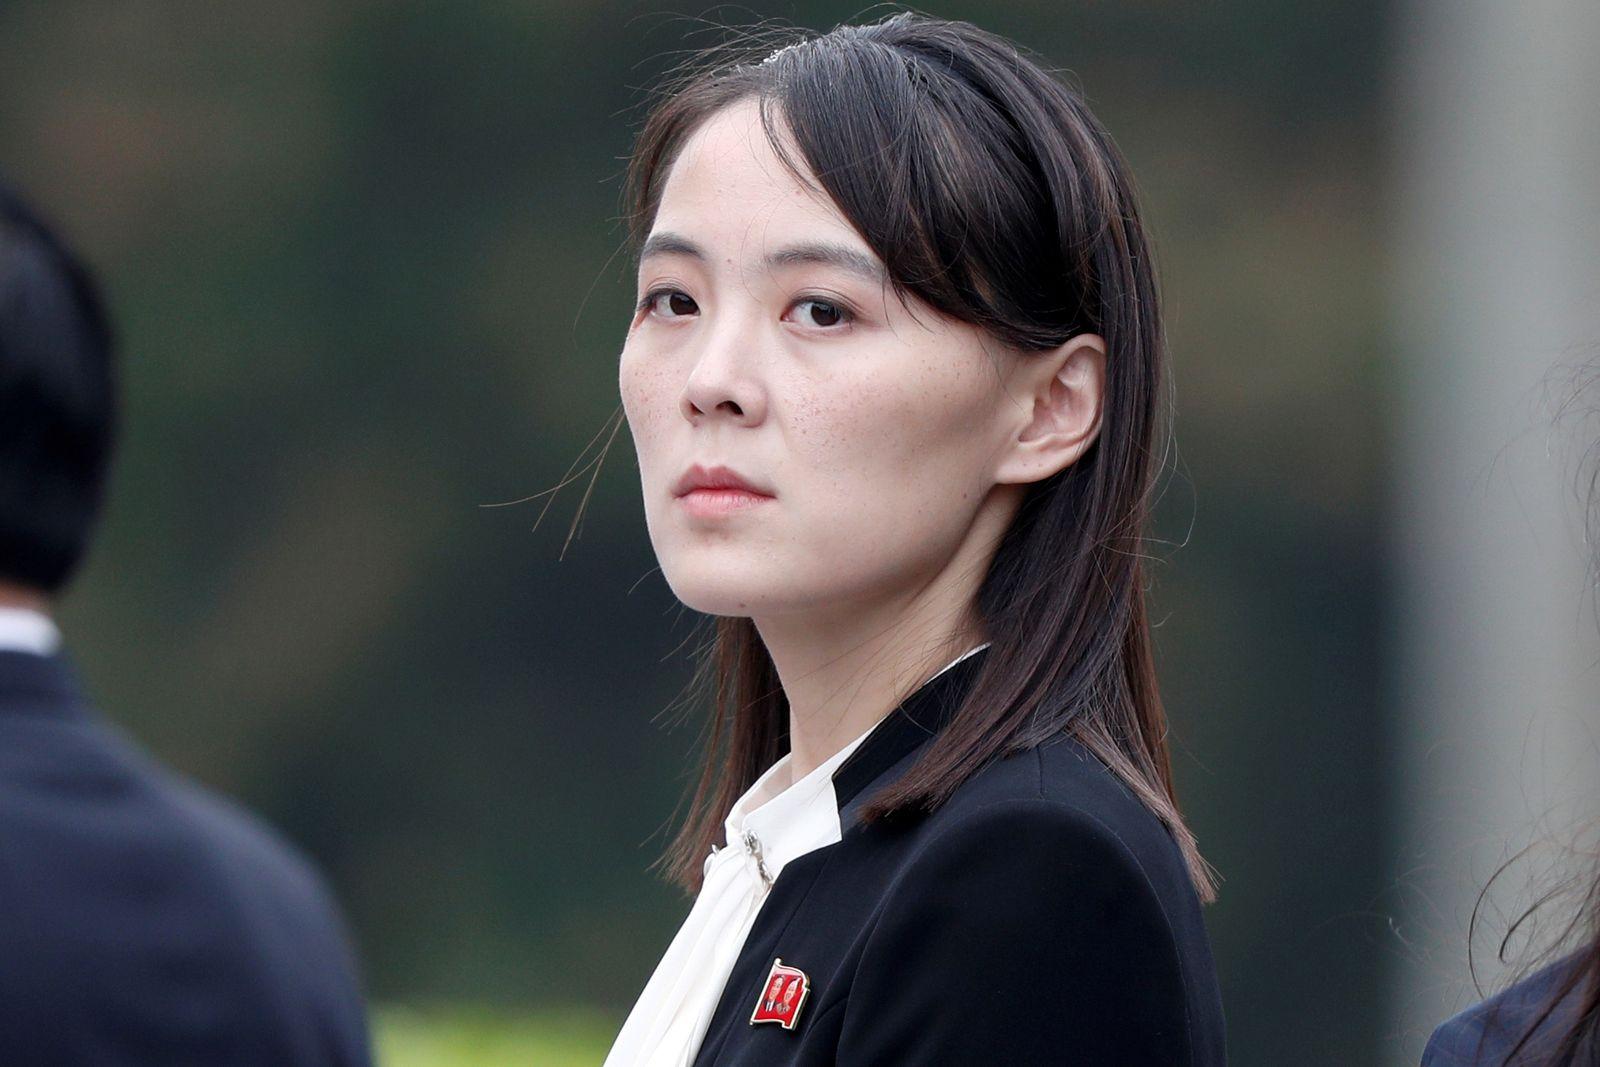 FILE PHOTO: Kim Yo Jong, sister of North Korea's leader Kim Jong Un attends wreath laying ceremony at Ho Chi Minh Mausoleum in Hanoi